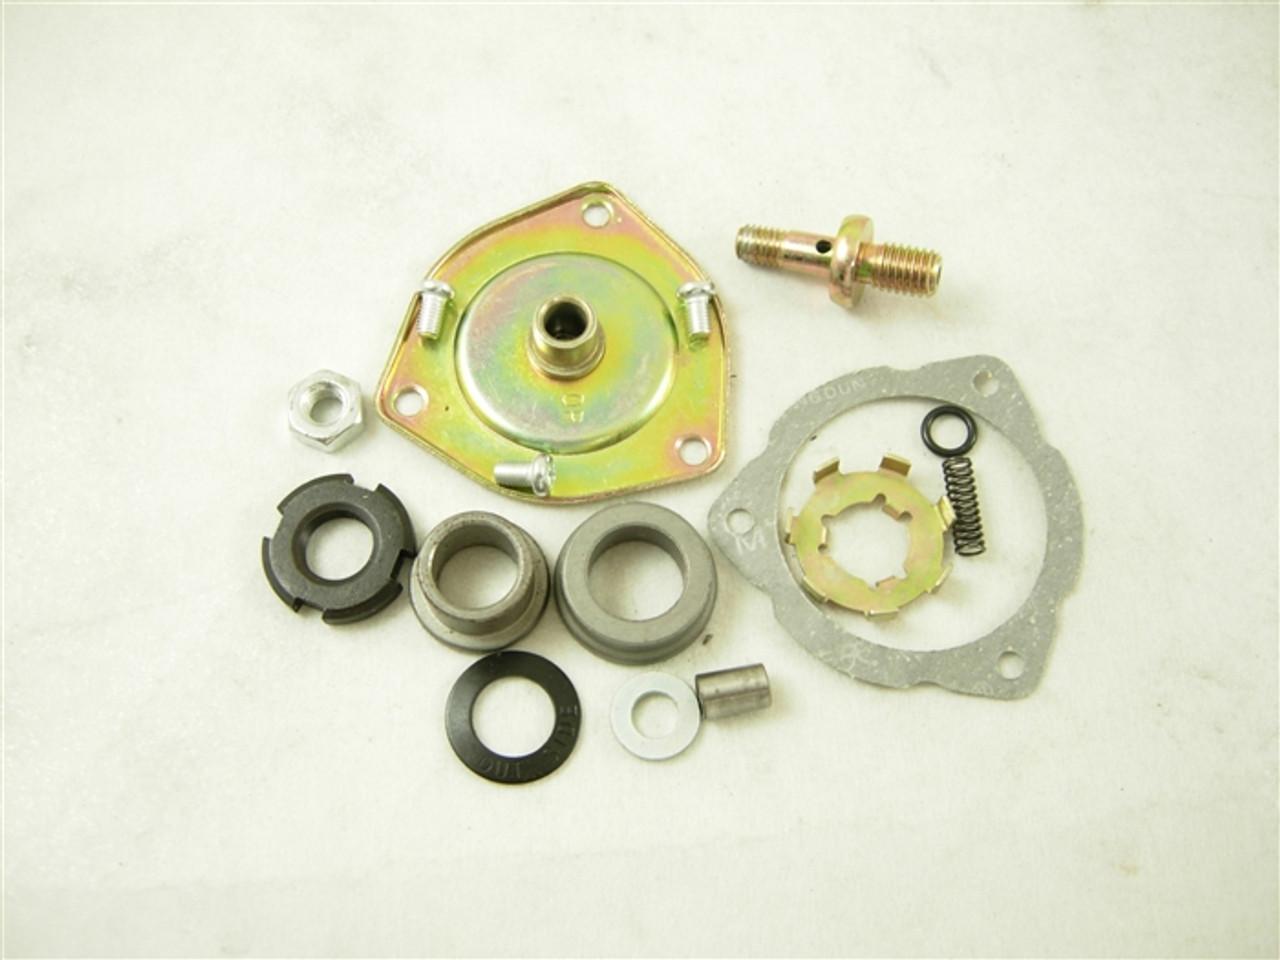 clutch screws and nuts 13494-a195-2